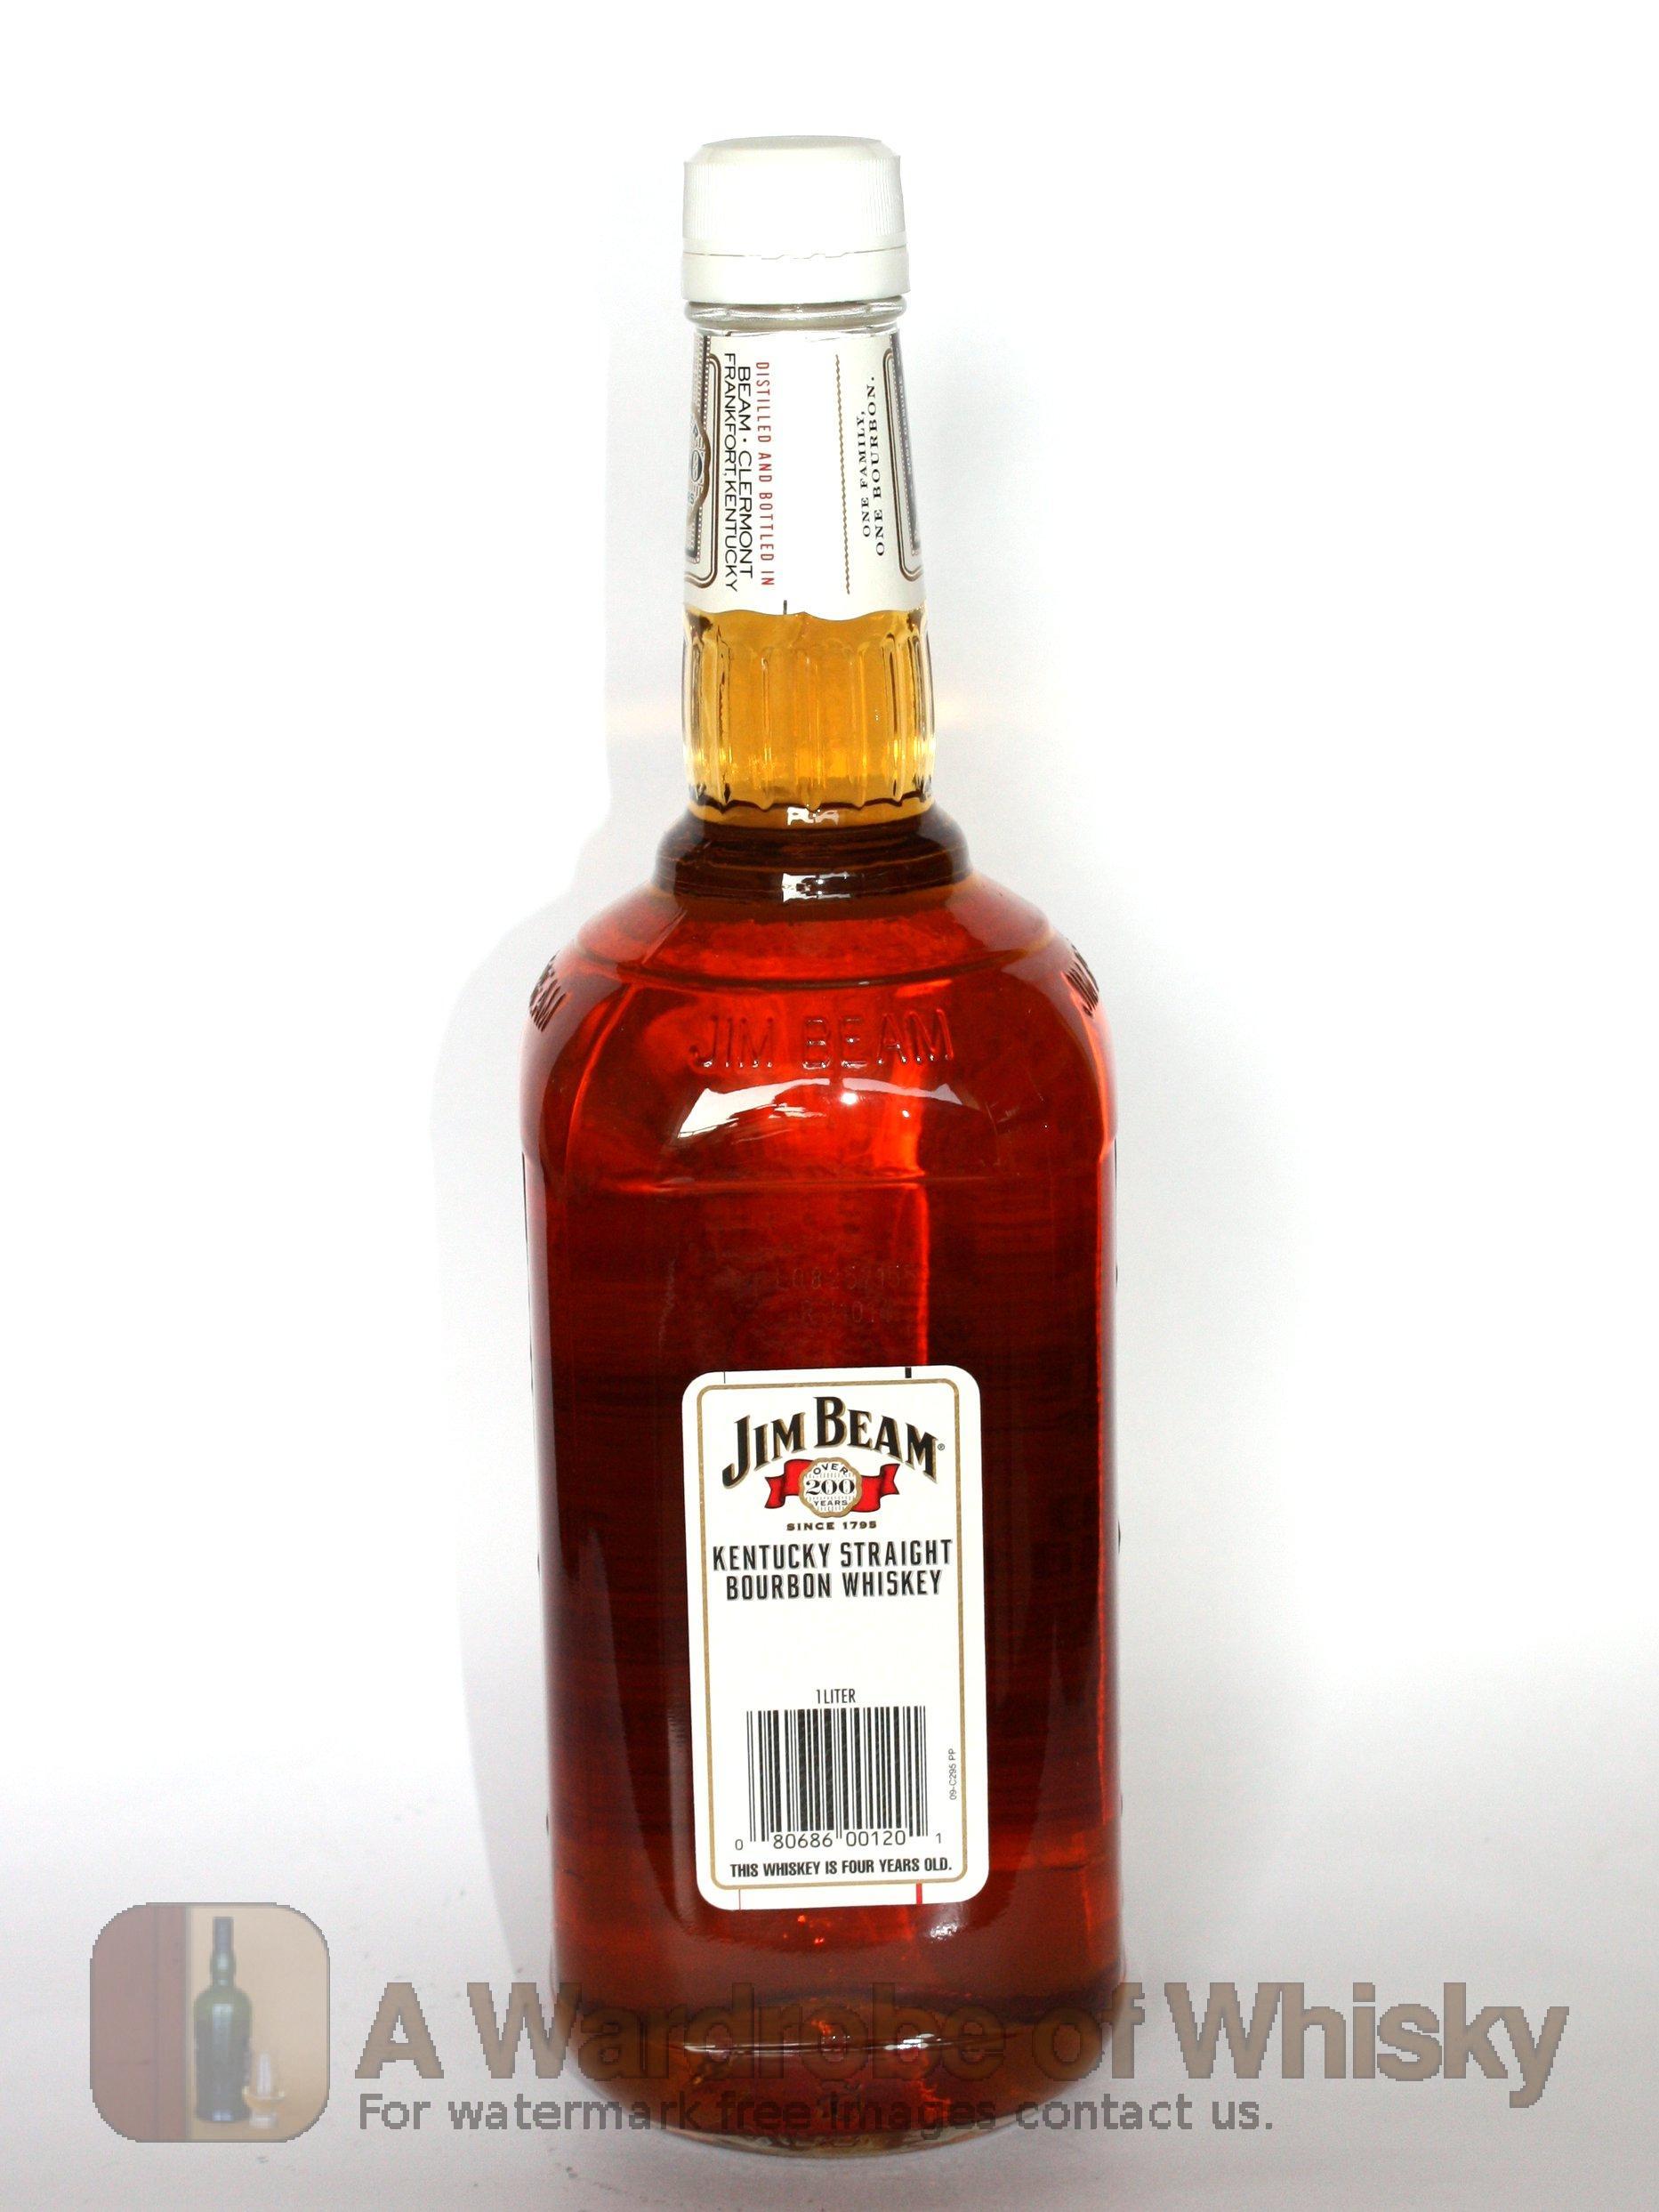 Buy Jim Beam Kentucky Straight Bourbon Whiskey Bourbon